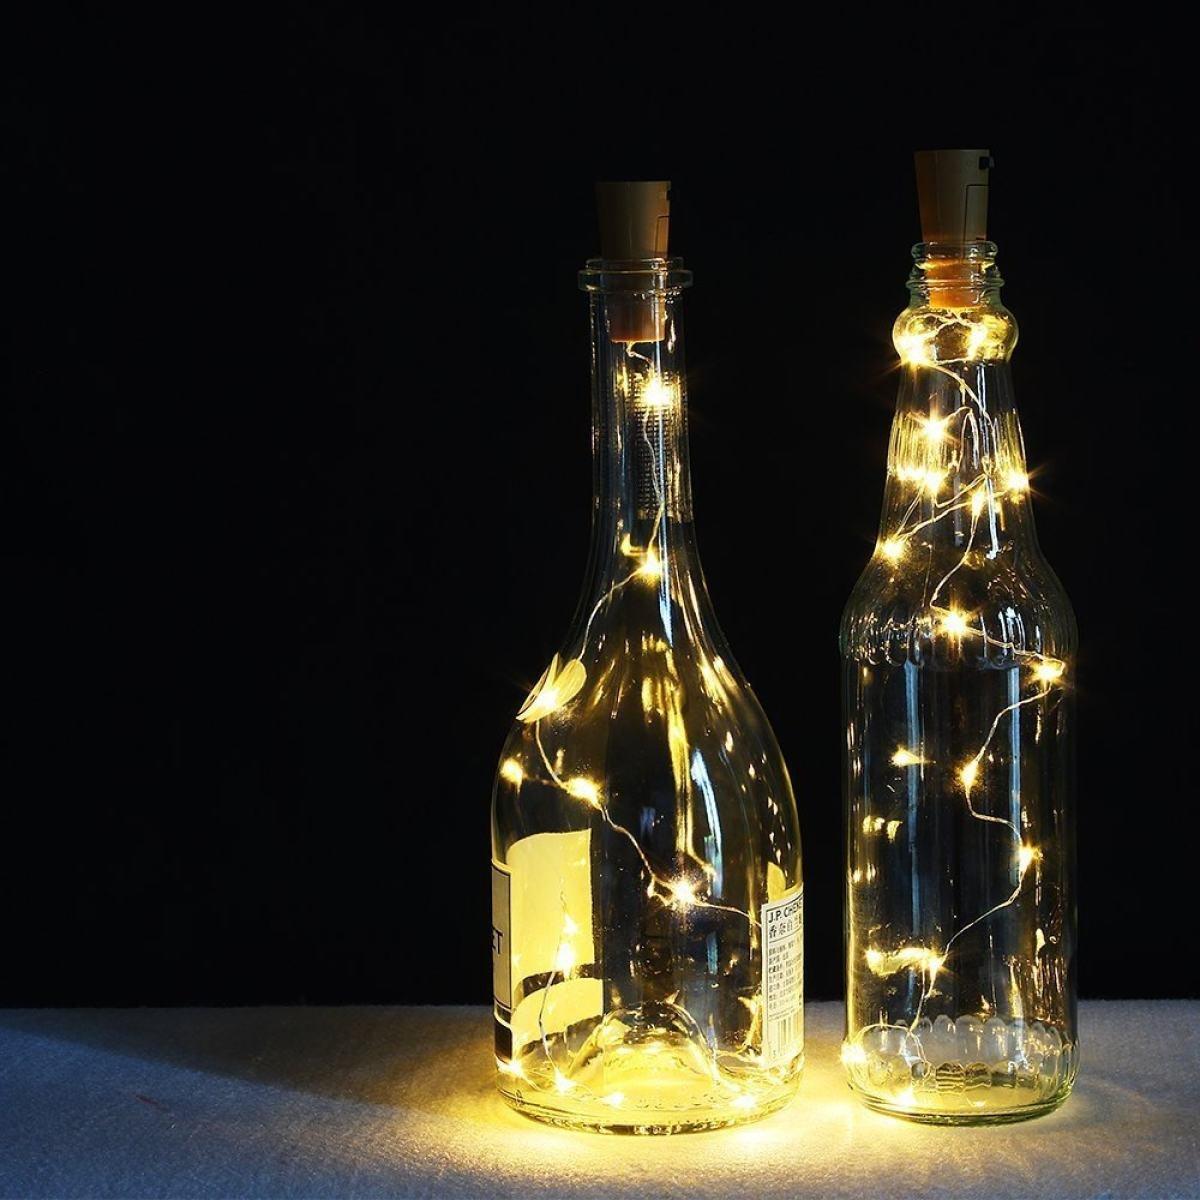 LGZOOT Botellas De Vino De Corcho De Luces De 8 2 Pies / 2 5 Millones De LED De Cobre Luces De Alambre Estrellado Luces LED Navidad Boda Y Fiesta De ...